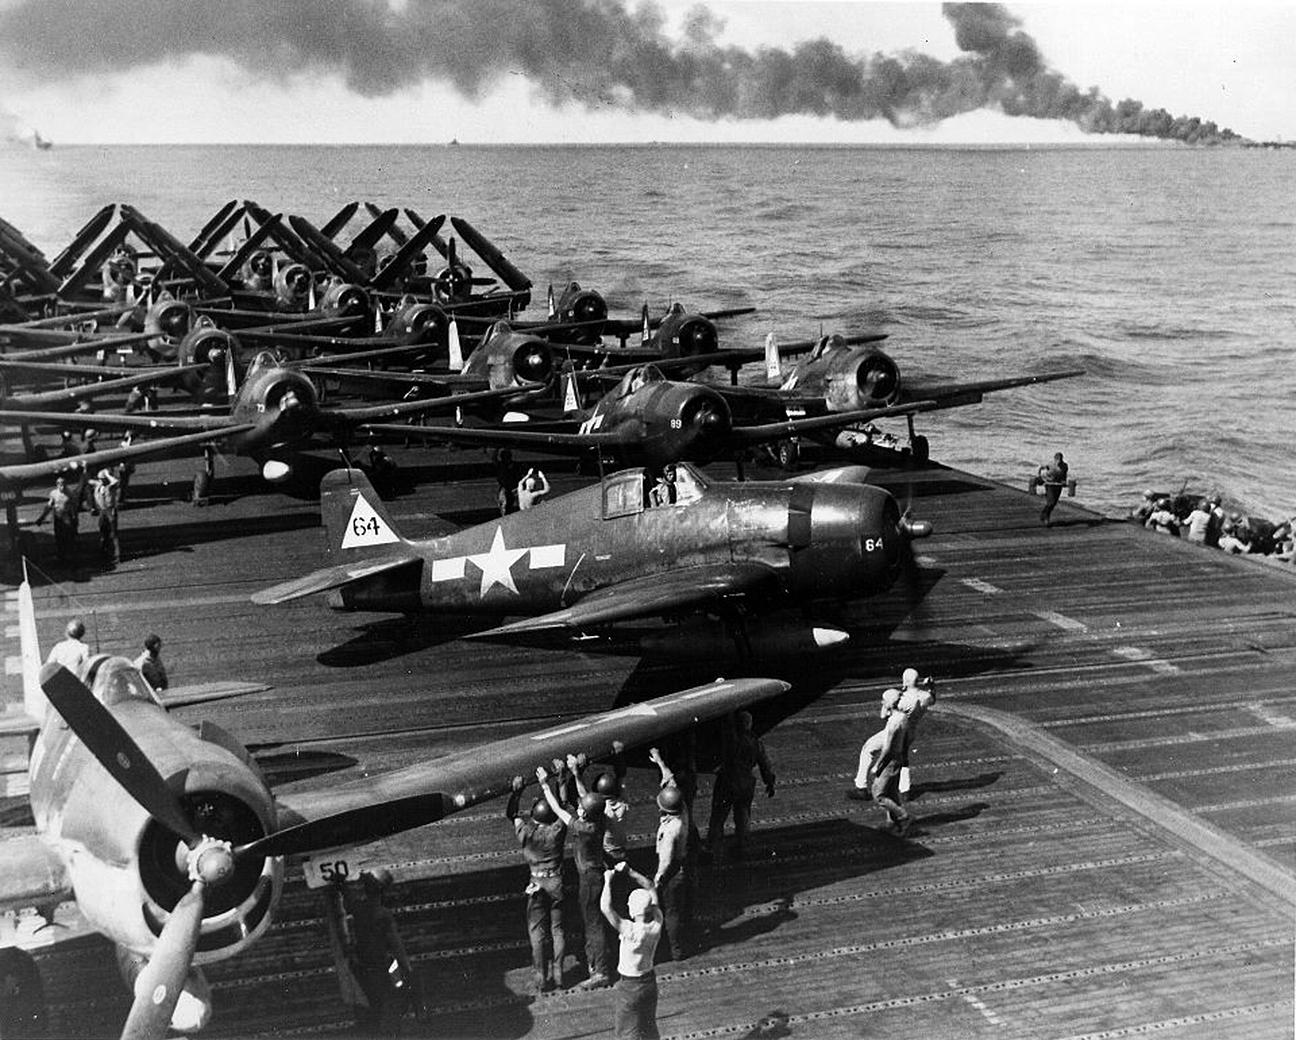 Grumman F6F 5 Hellcat VF 20 White 64 preparing for launch CV 6 USS Enterprise 01